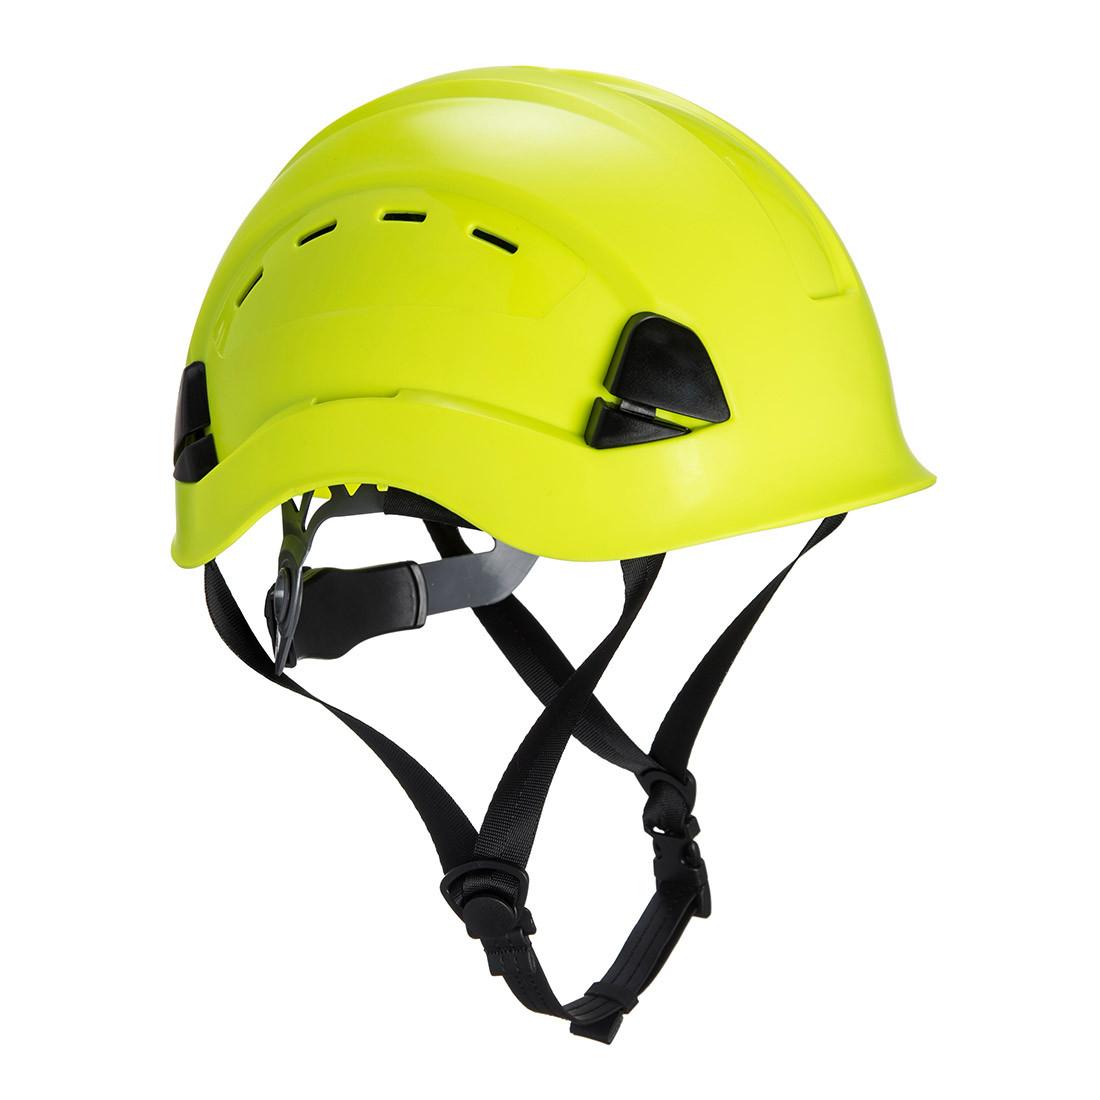 Casca Alpinist Height Endurance - Echipamente de protectie personala